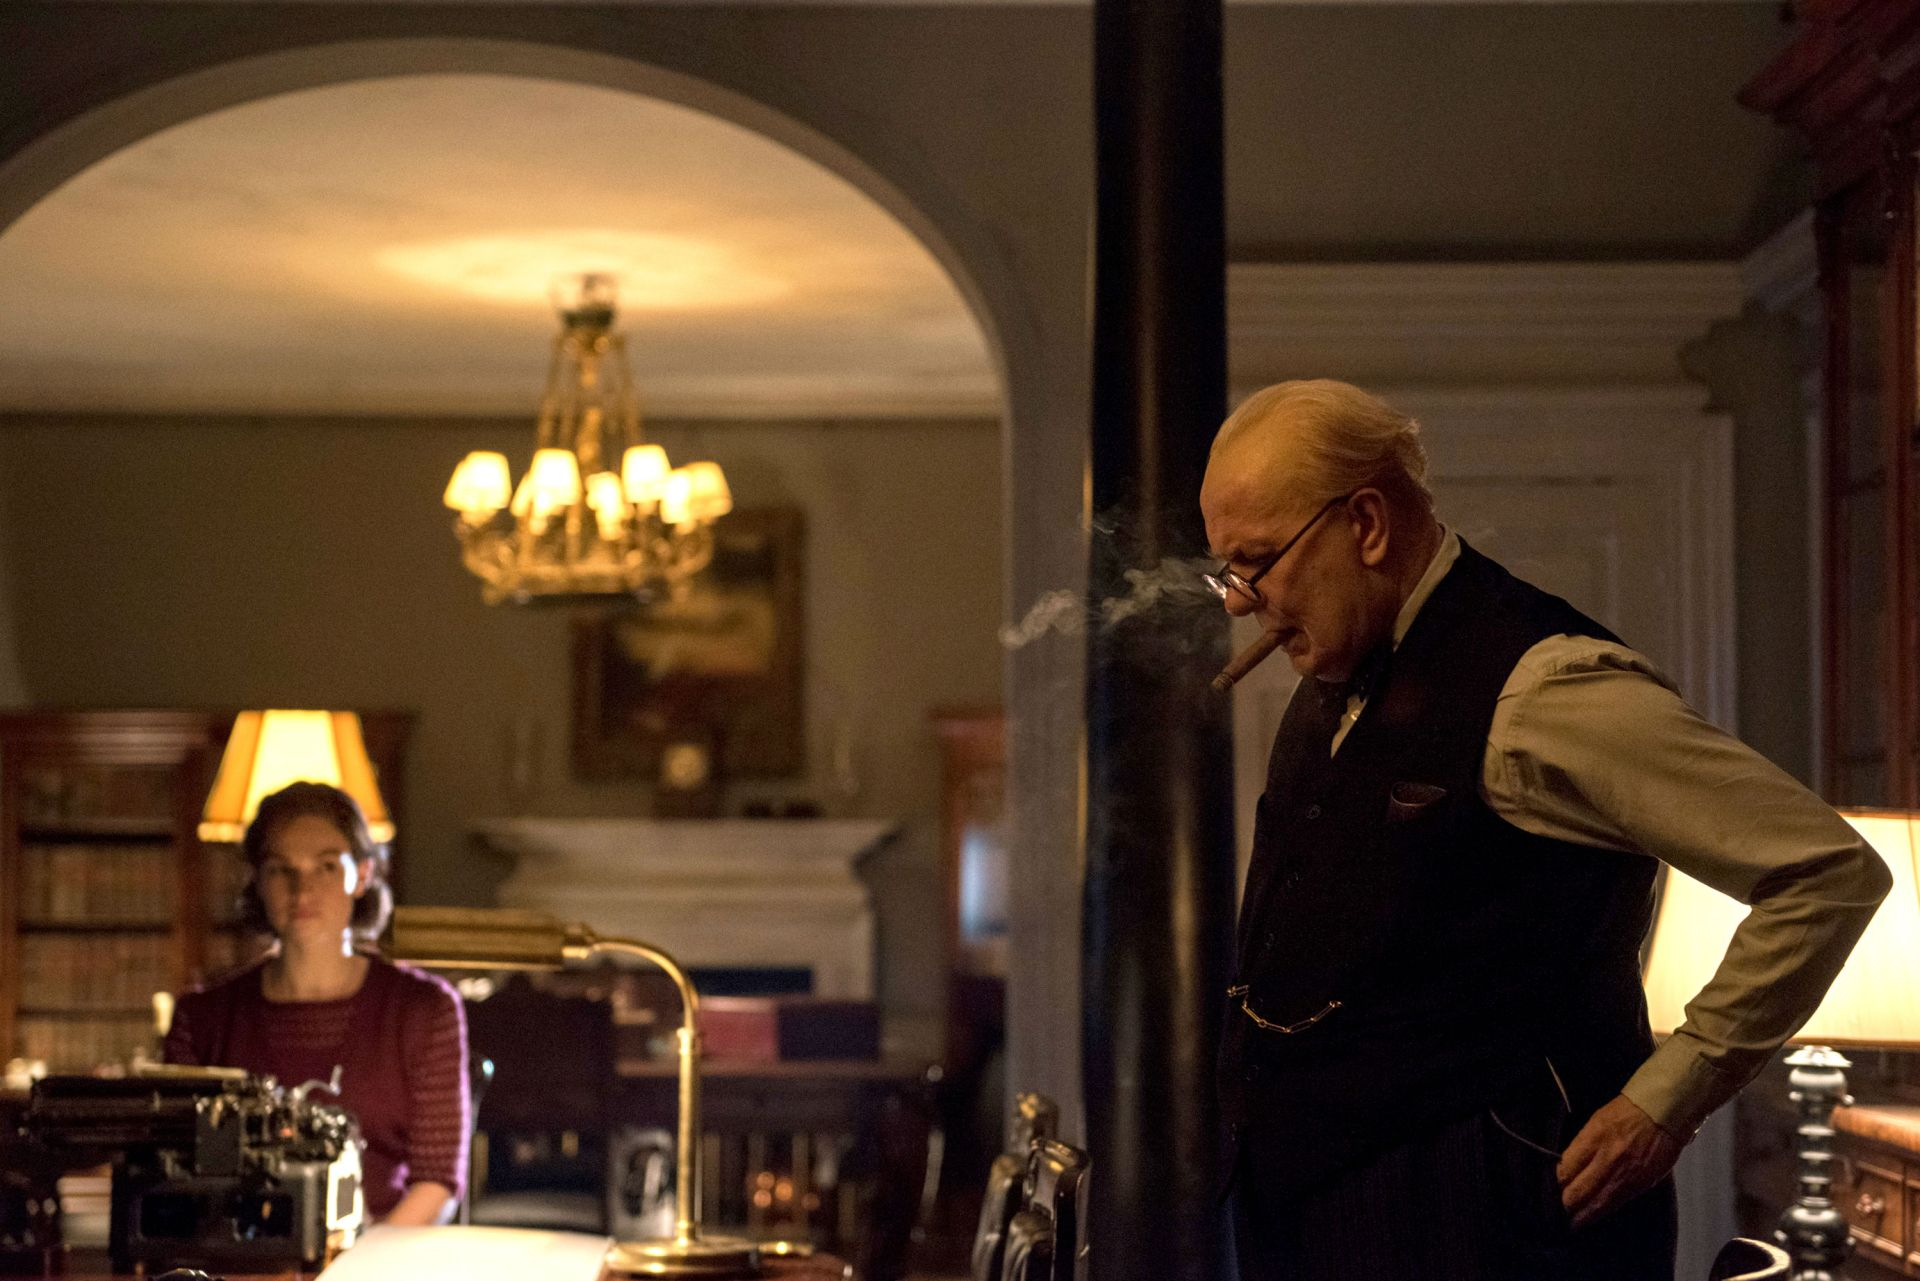 Darkest Hour, Gary Oldman, Lily James, Churchill with his typist Elizabeth Layton